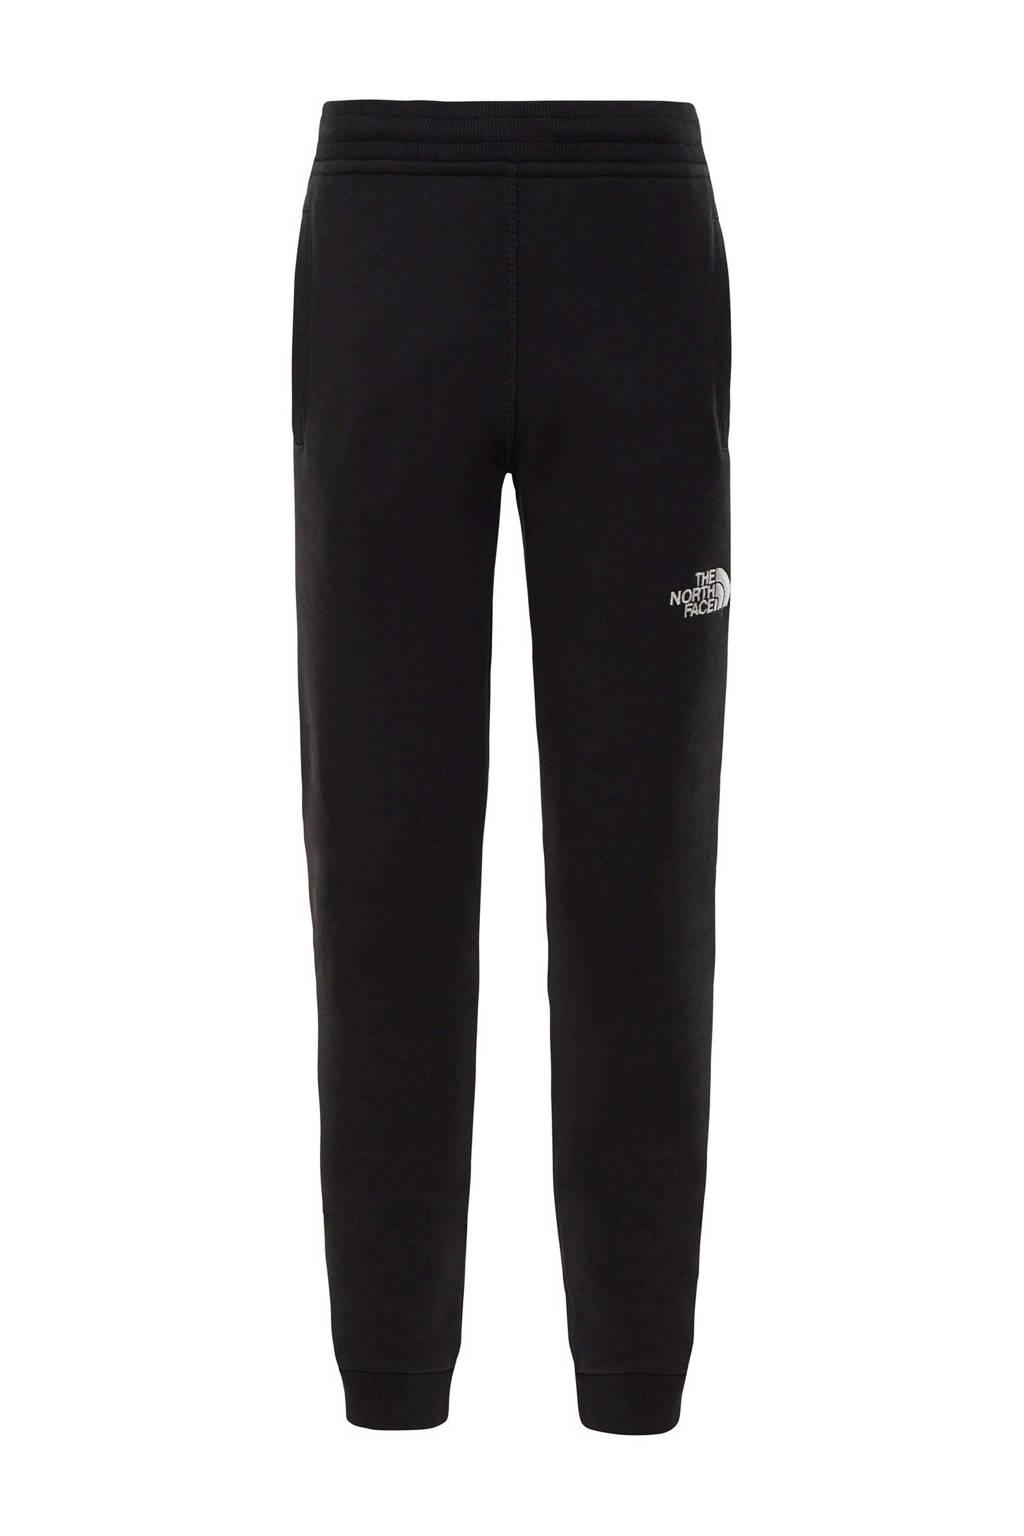 The North Face   joggingbroek zwart, Tnf-black-tnf-white